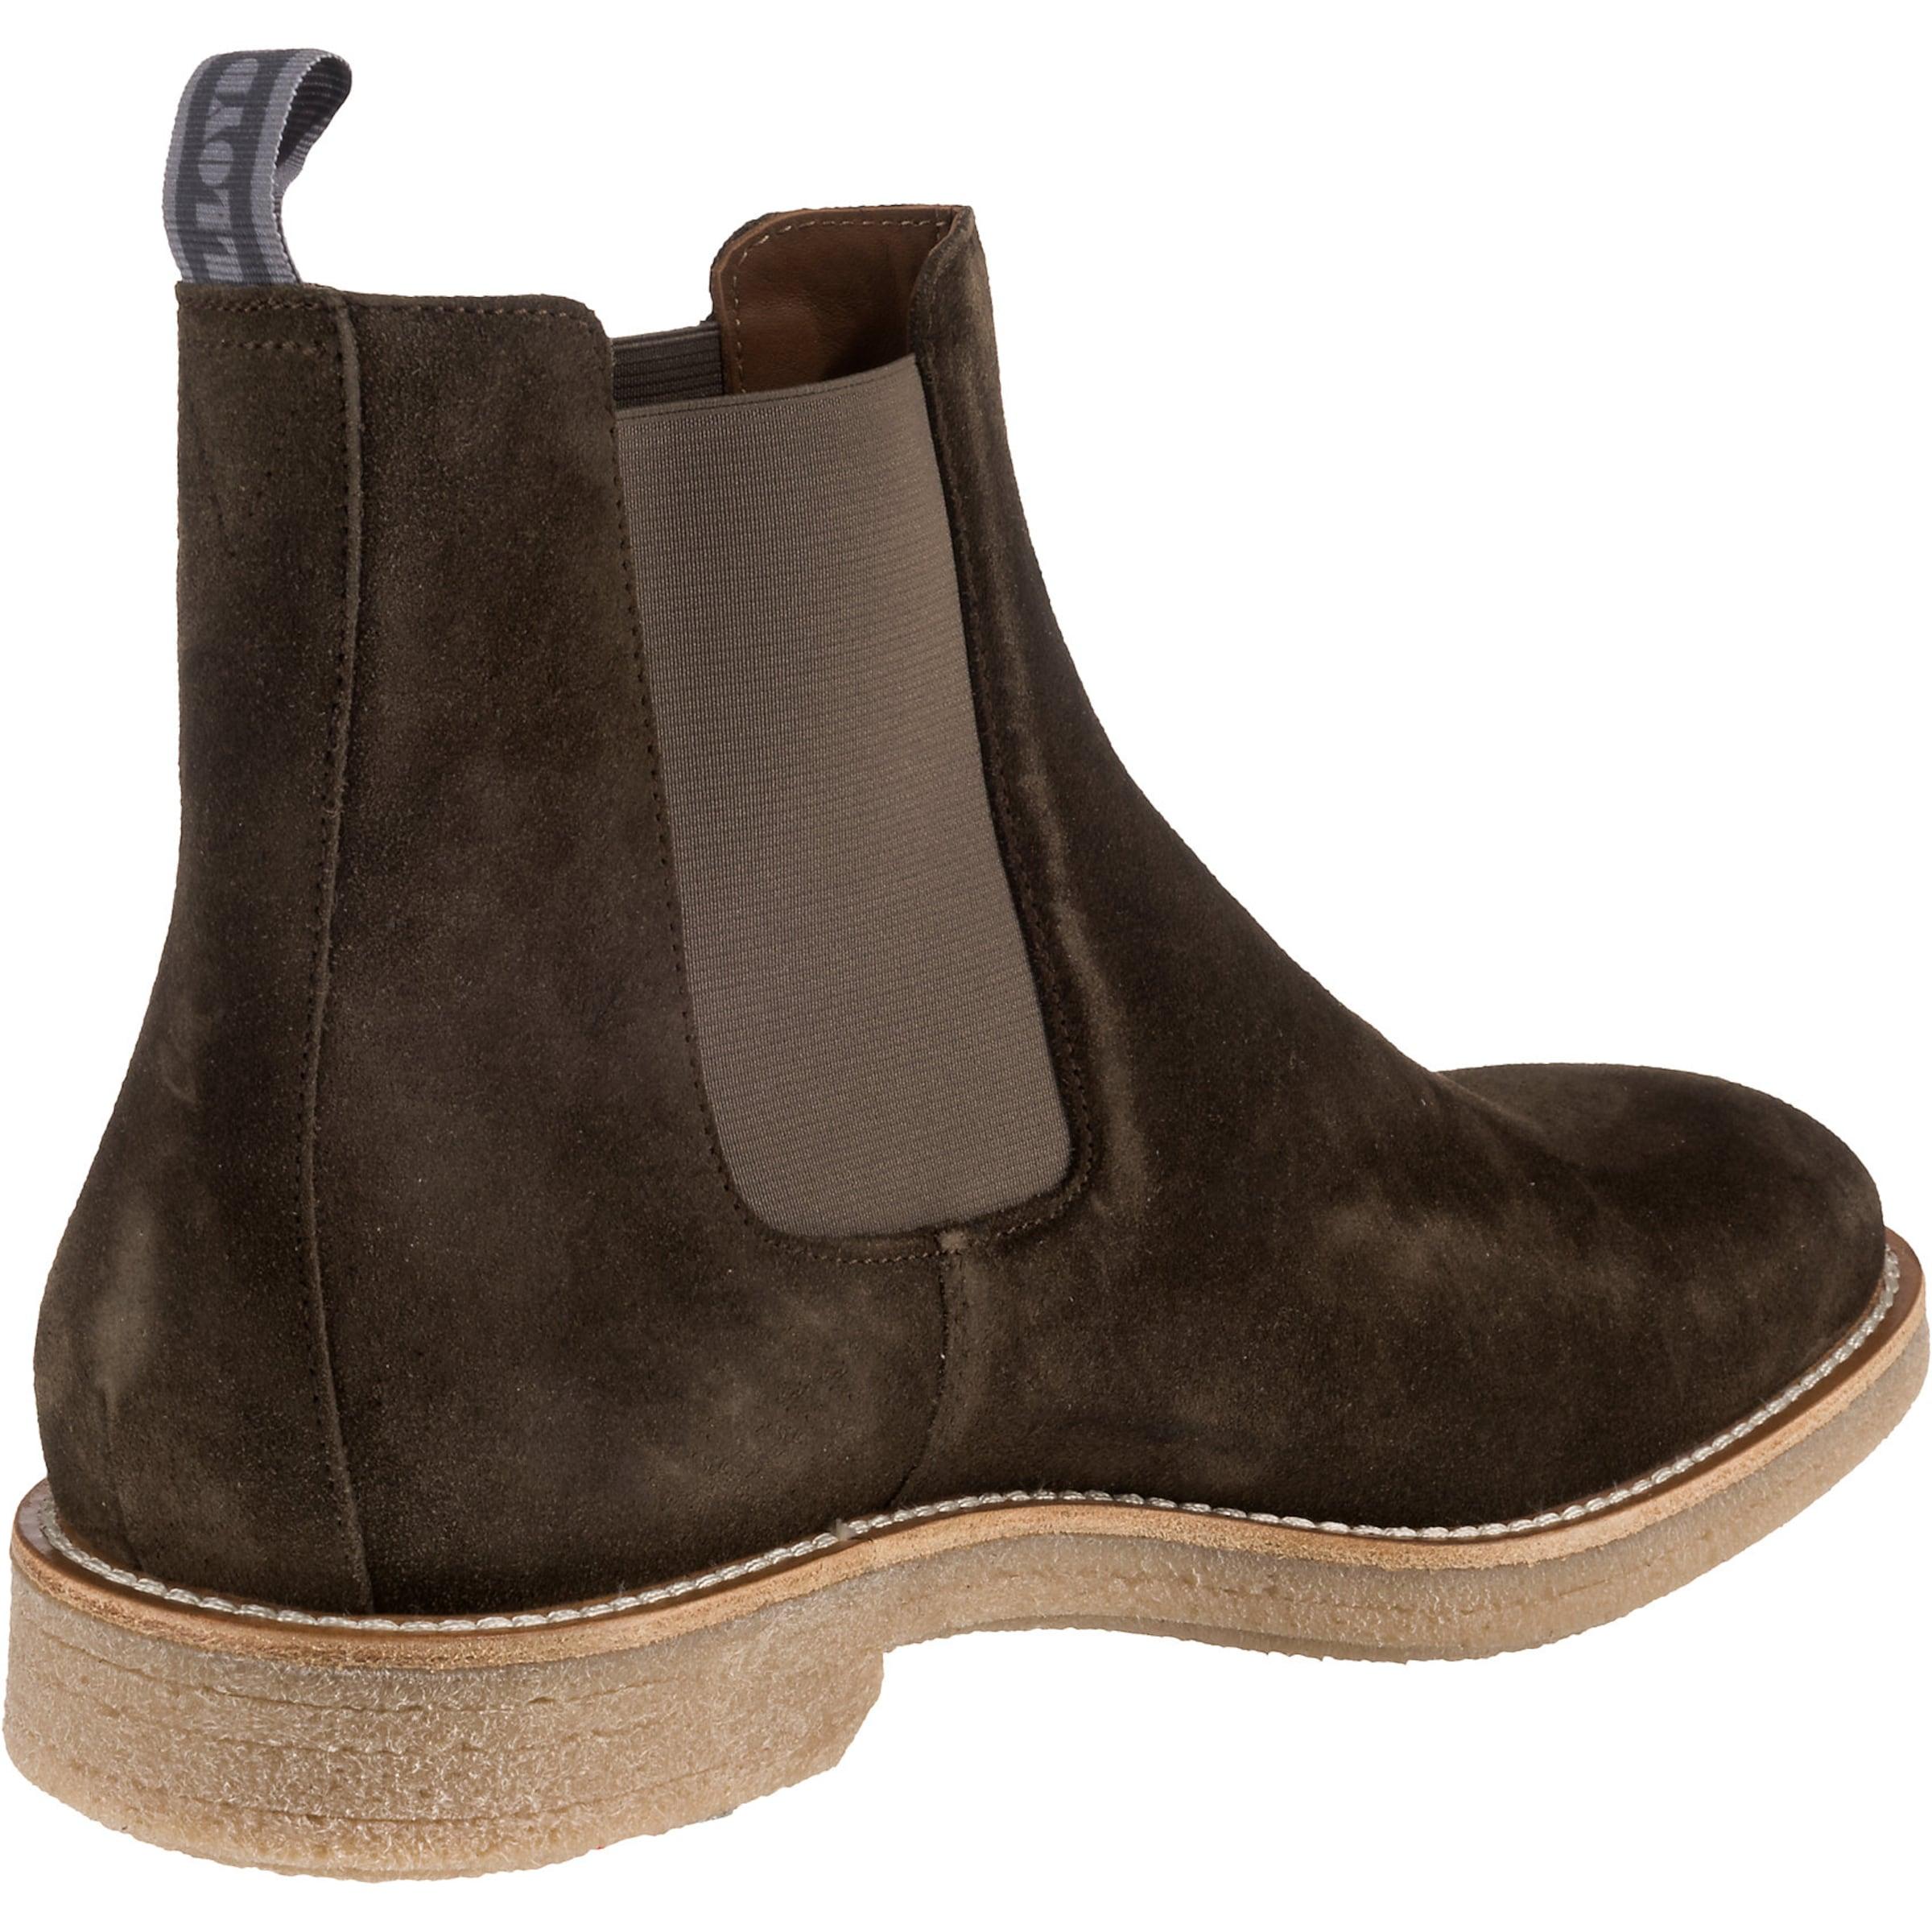 'galvestone' Brun Boots En Foncé Lloyd Chelsea doCxEreBQW